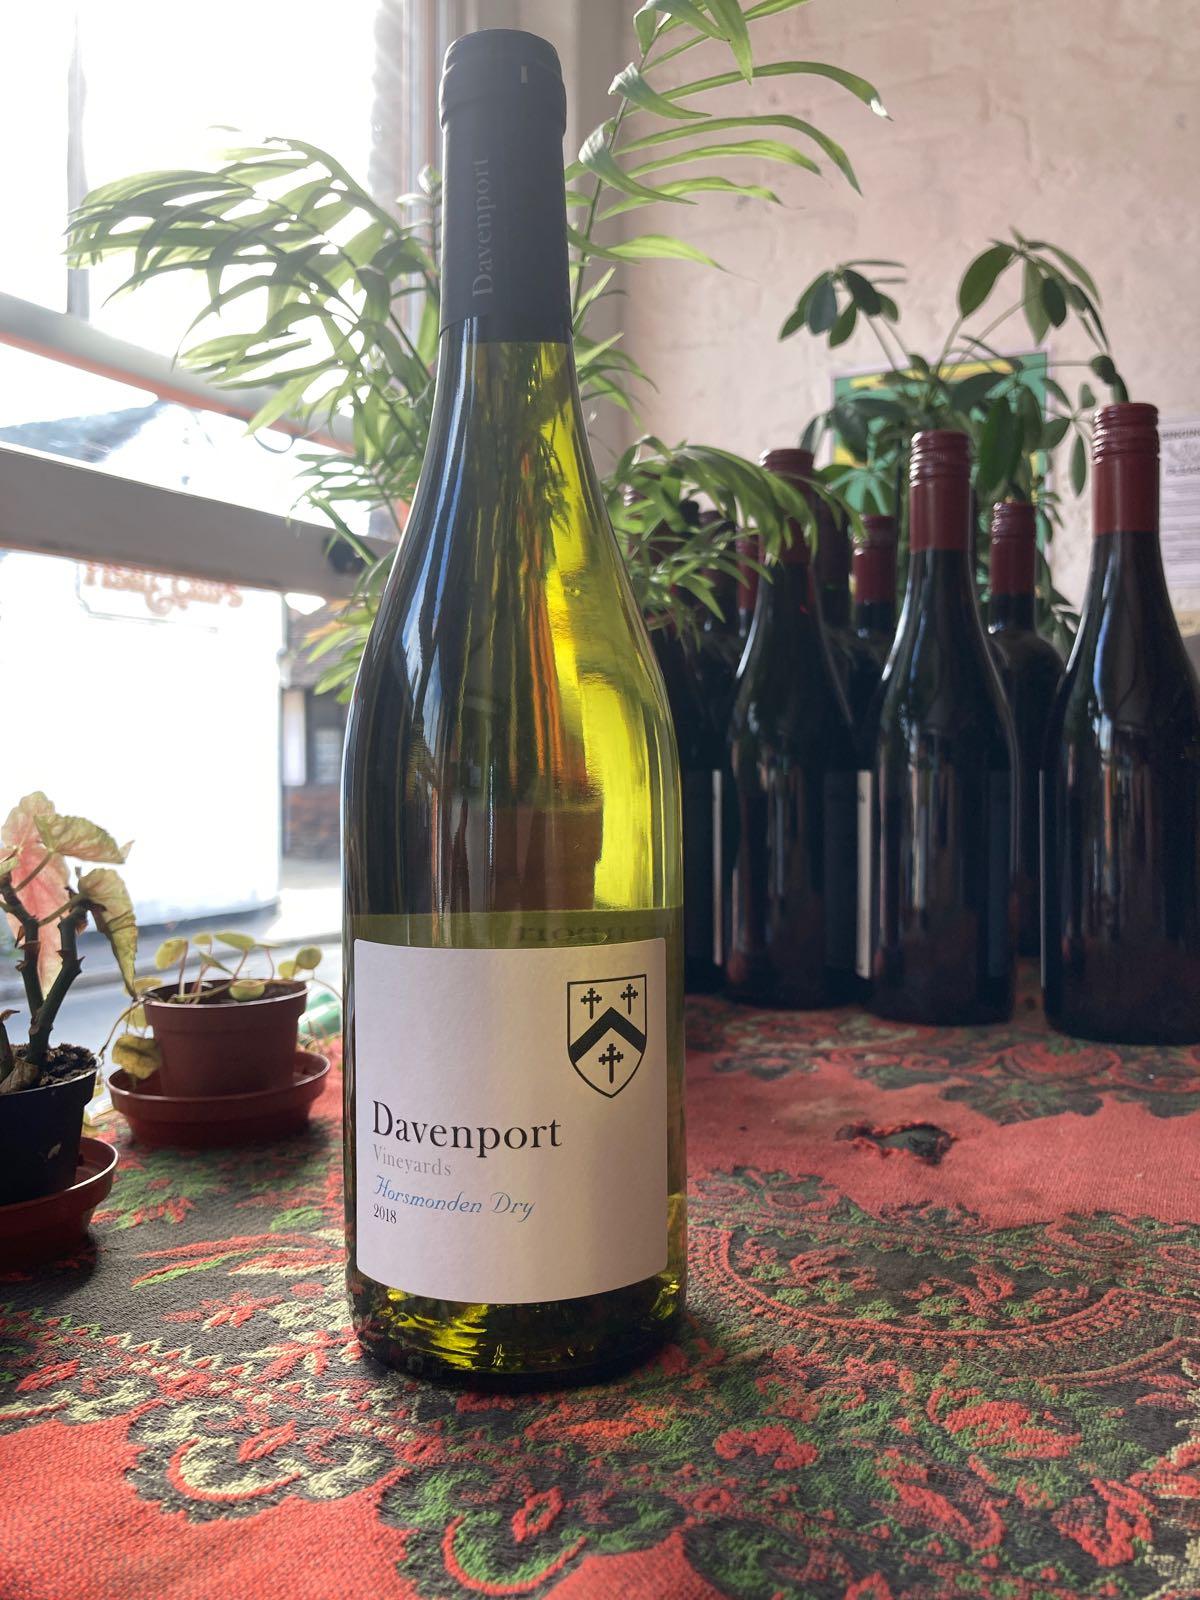 Davenport - Horsmonden Dry White (11.5%) (East Sussex/Kent)